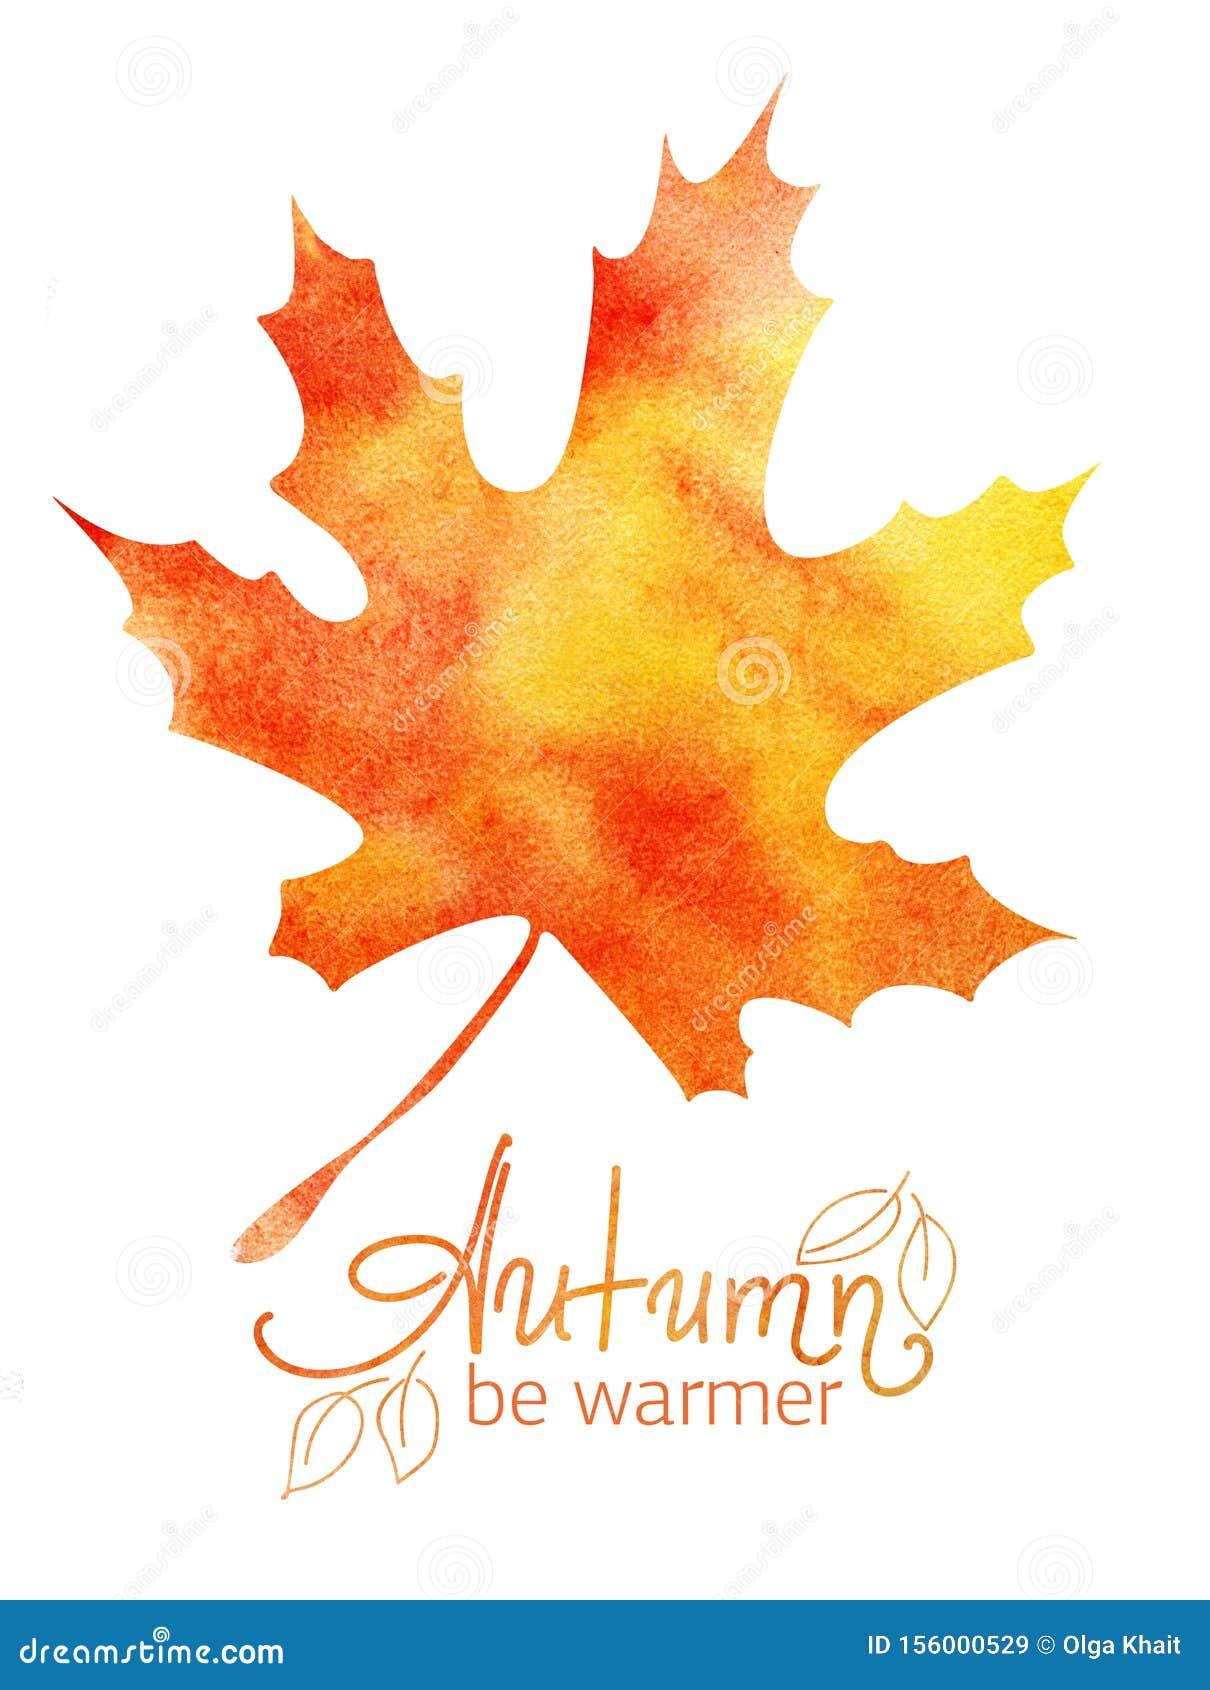 Decorative background. Autumn Maple Leaf Orange Yellow Gradient. Handwritten word lettering Autumn. Abstract watercolor